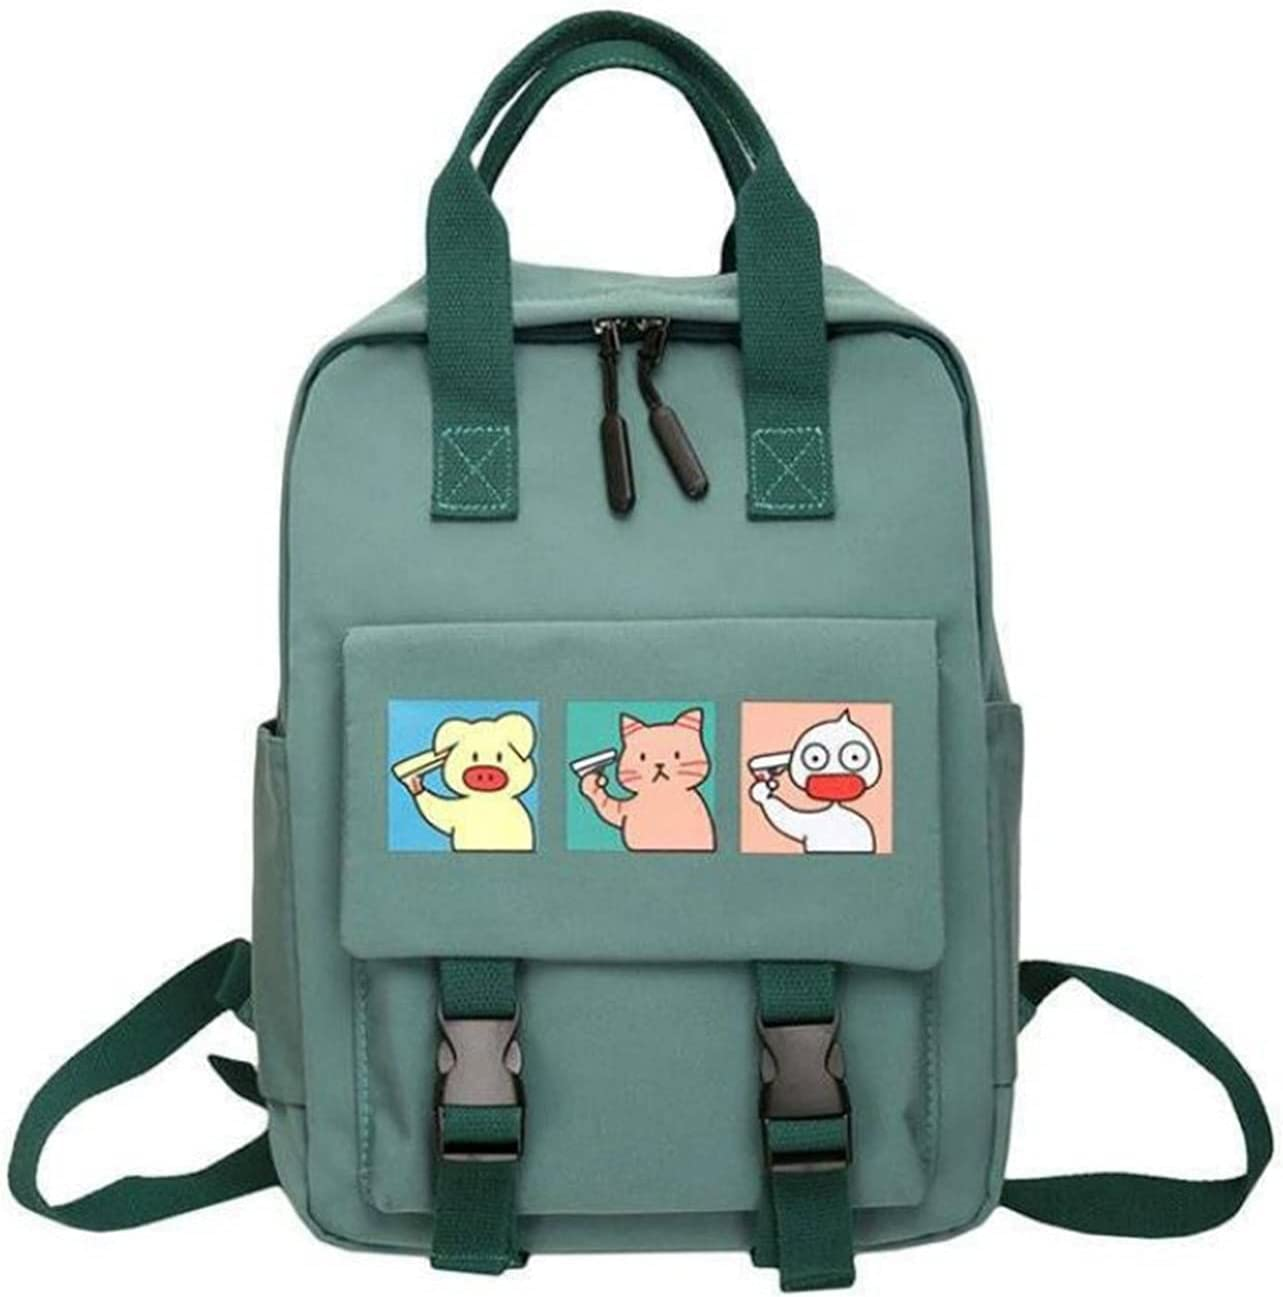 xuebin Cute School SALENEW very popular Backpacks Women Backpack for Waterproof Teena NEW before selling